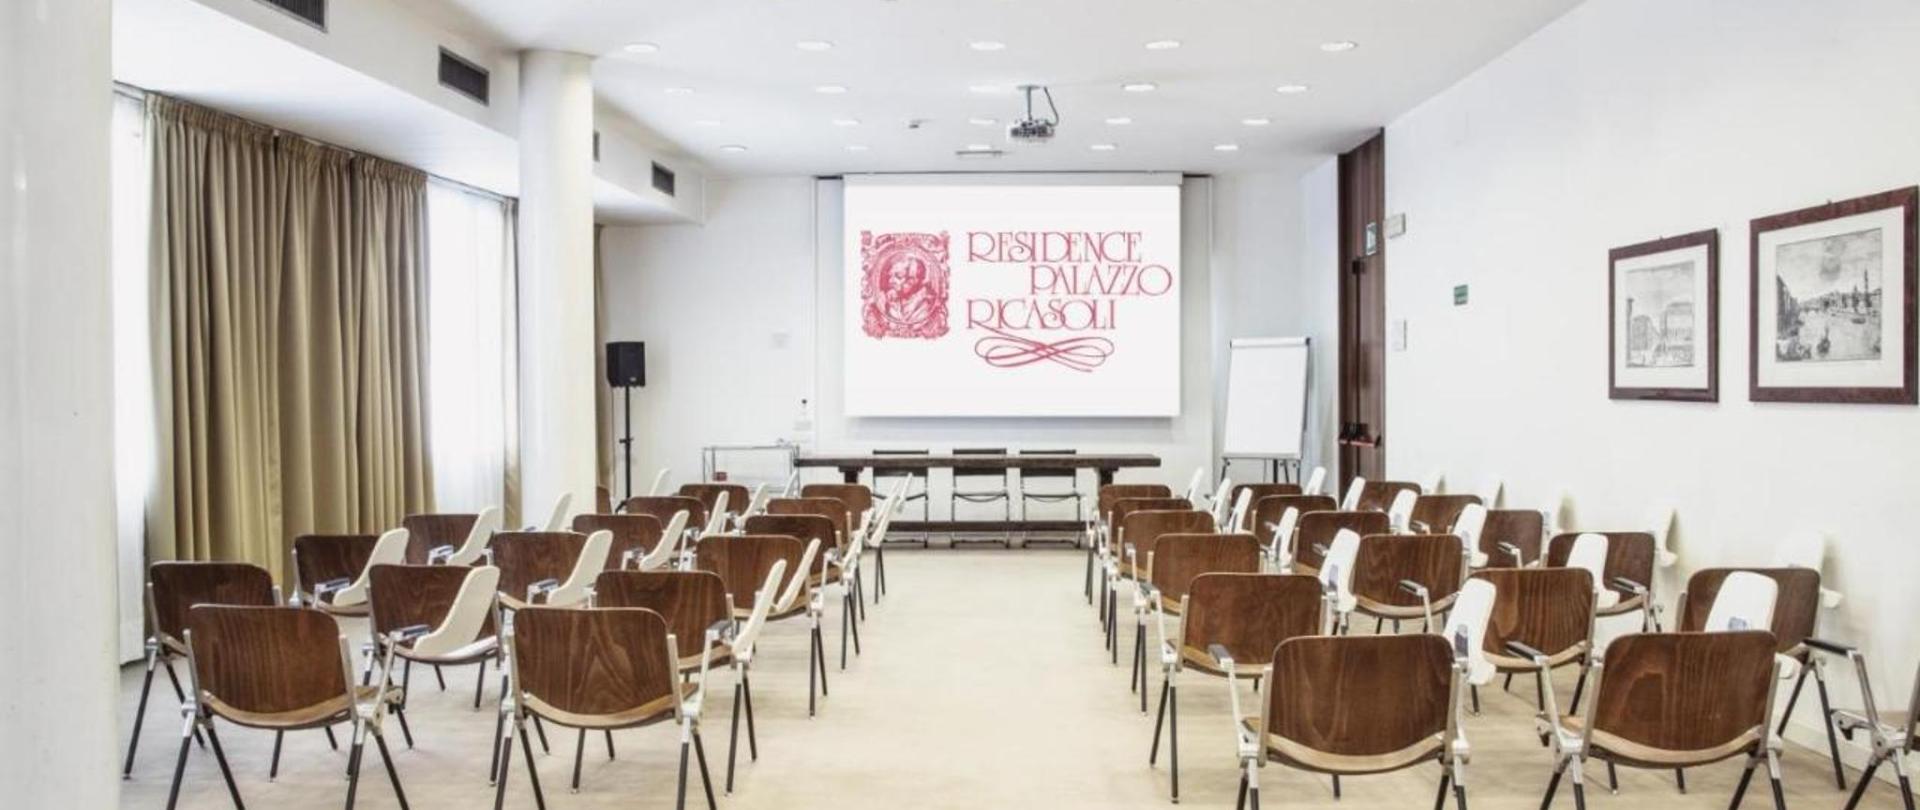 Hotel Palazzo Ricasoli